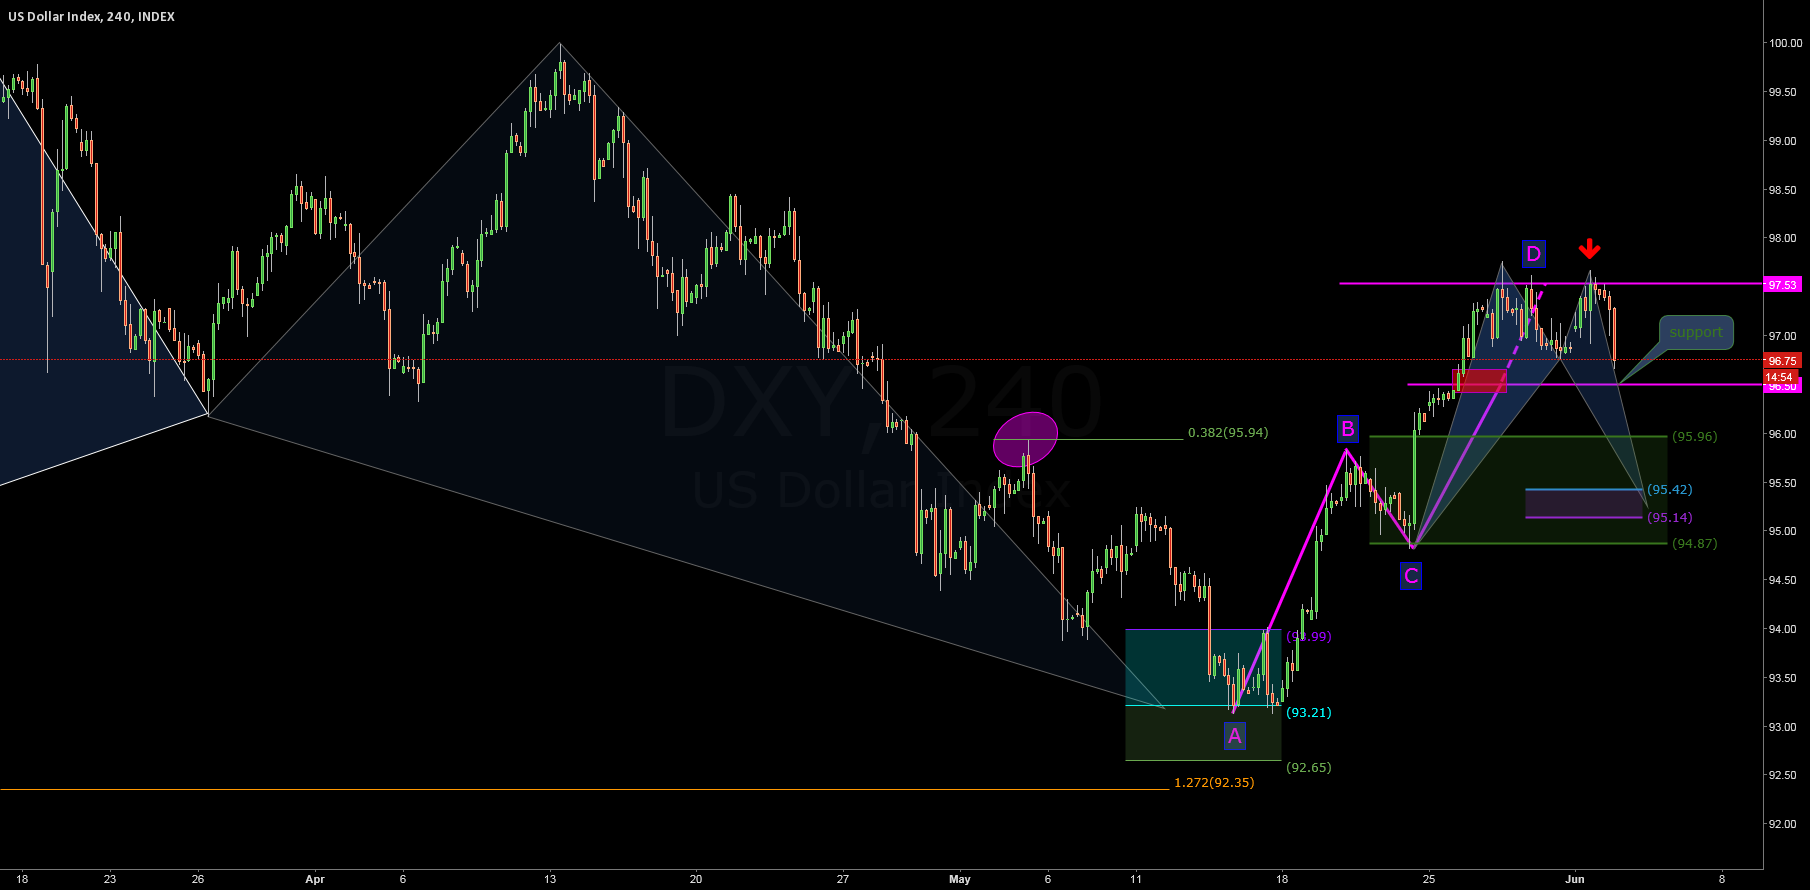 $DOLLAR INDEX: Consolidation?